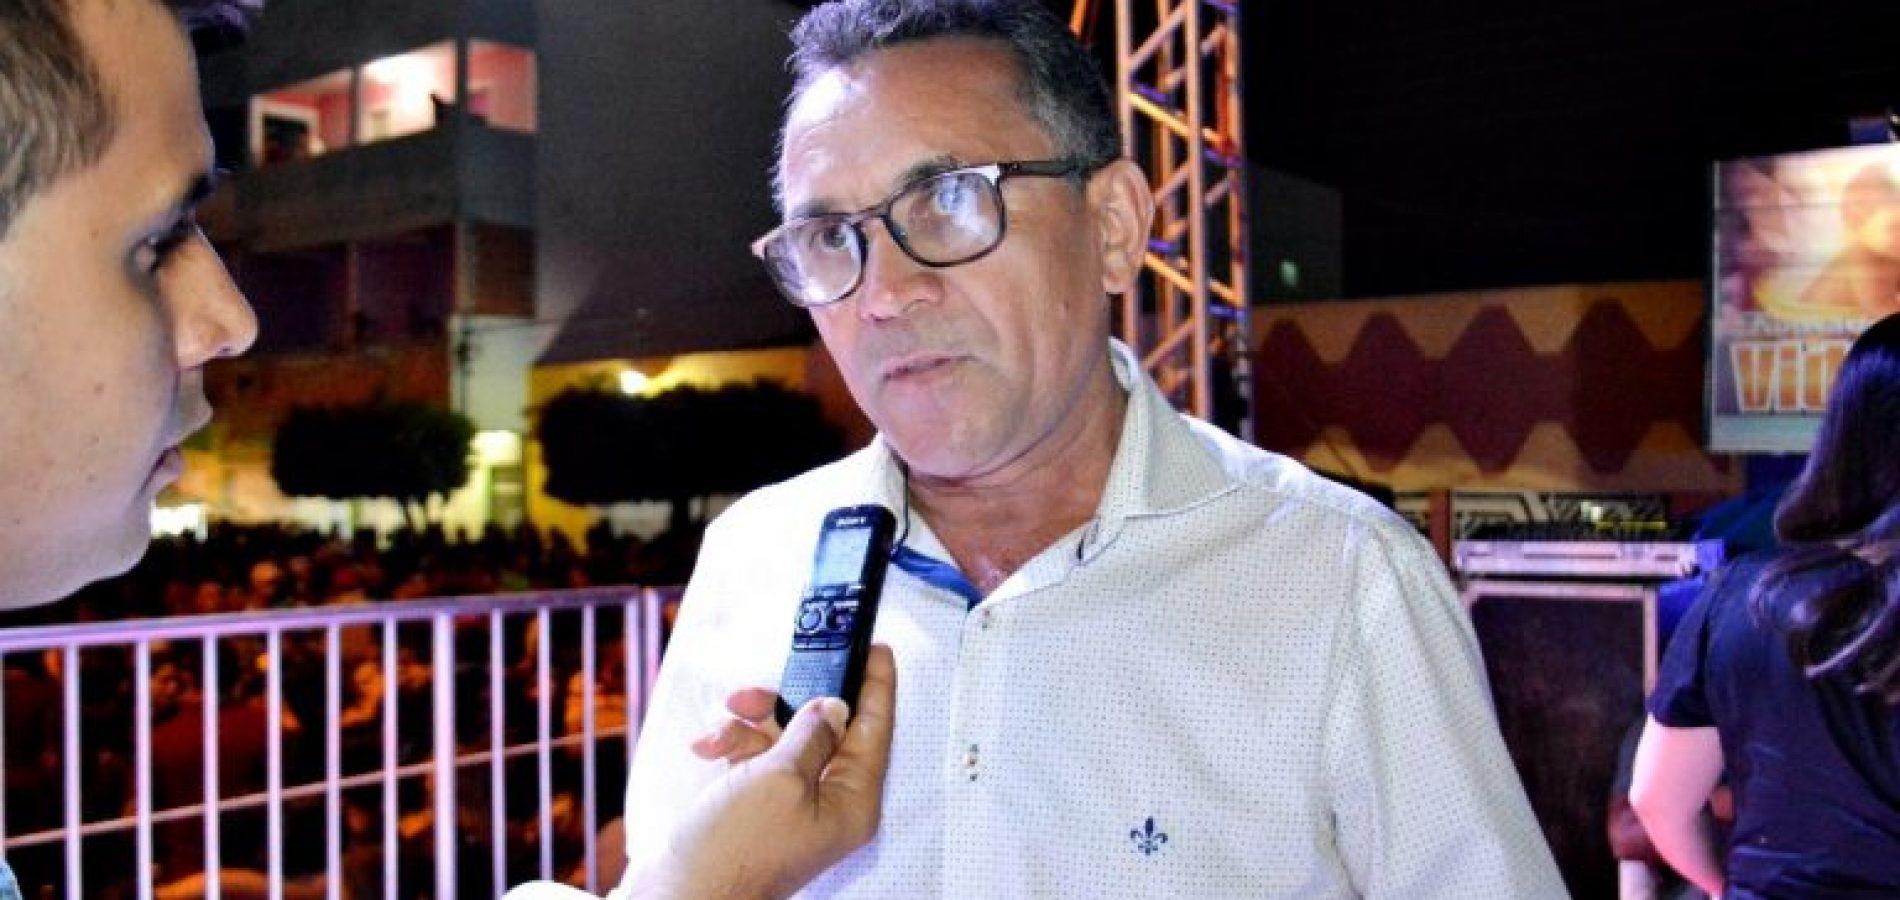 Ex-vereador de Marcolândia sofre tentativa de homicídio